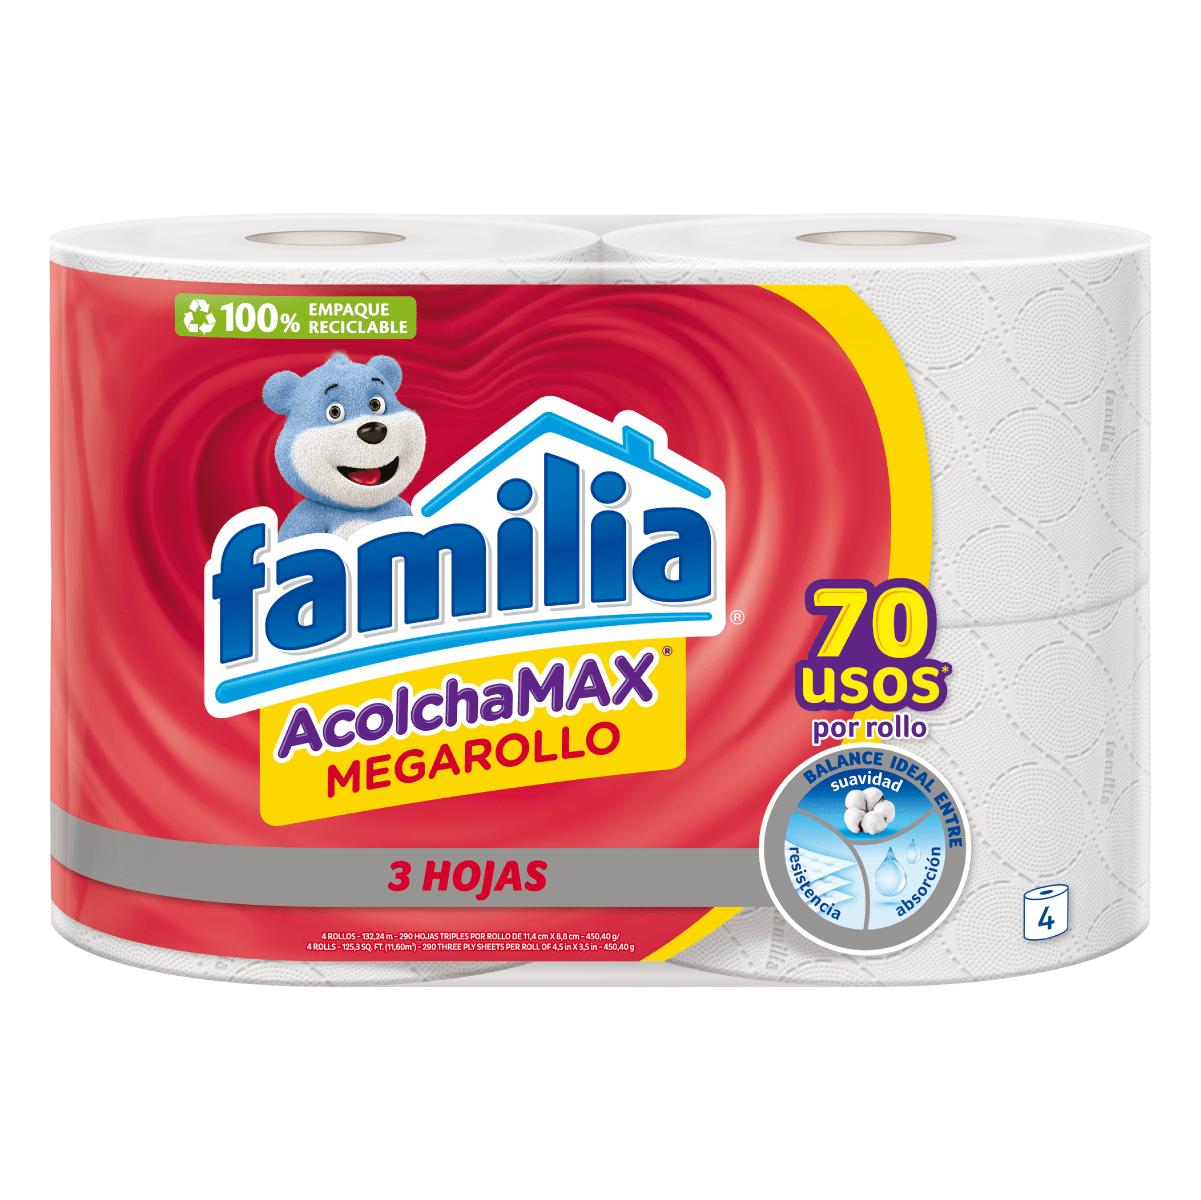 Imagen Papel Higiénico Familia AcolchaMAX MegaRollo X 4 Rollos